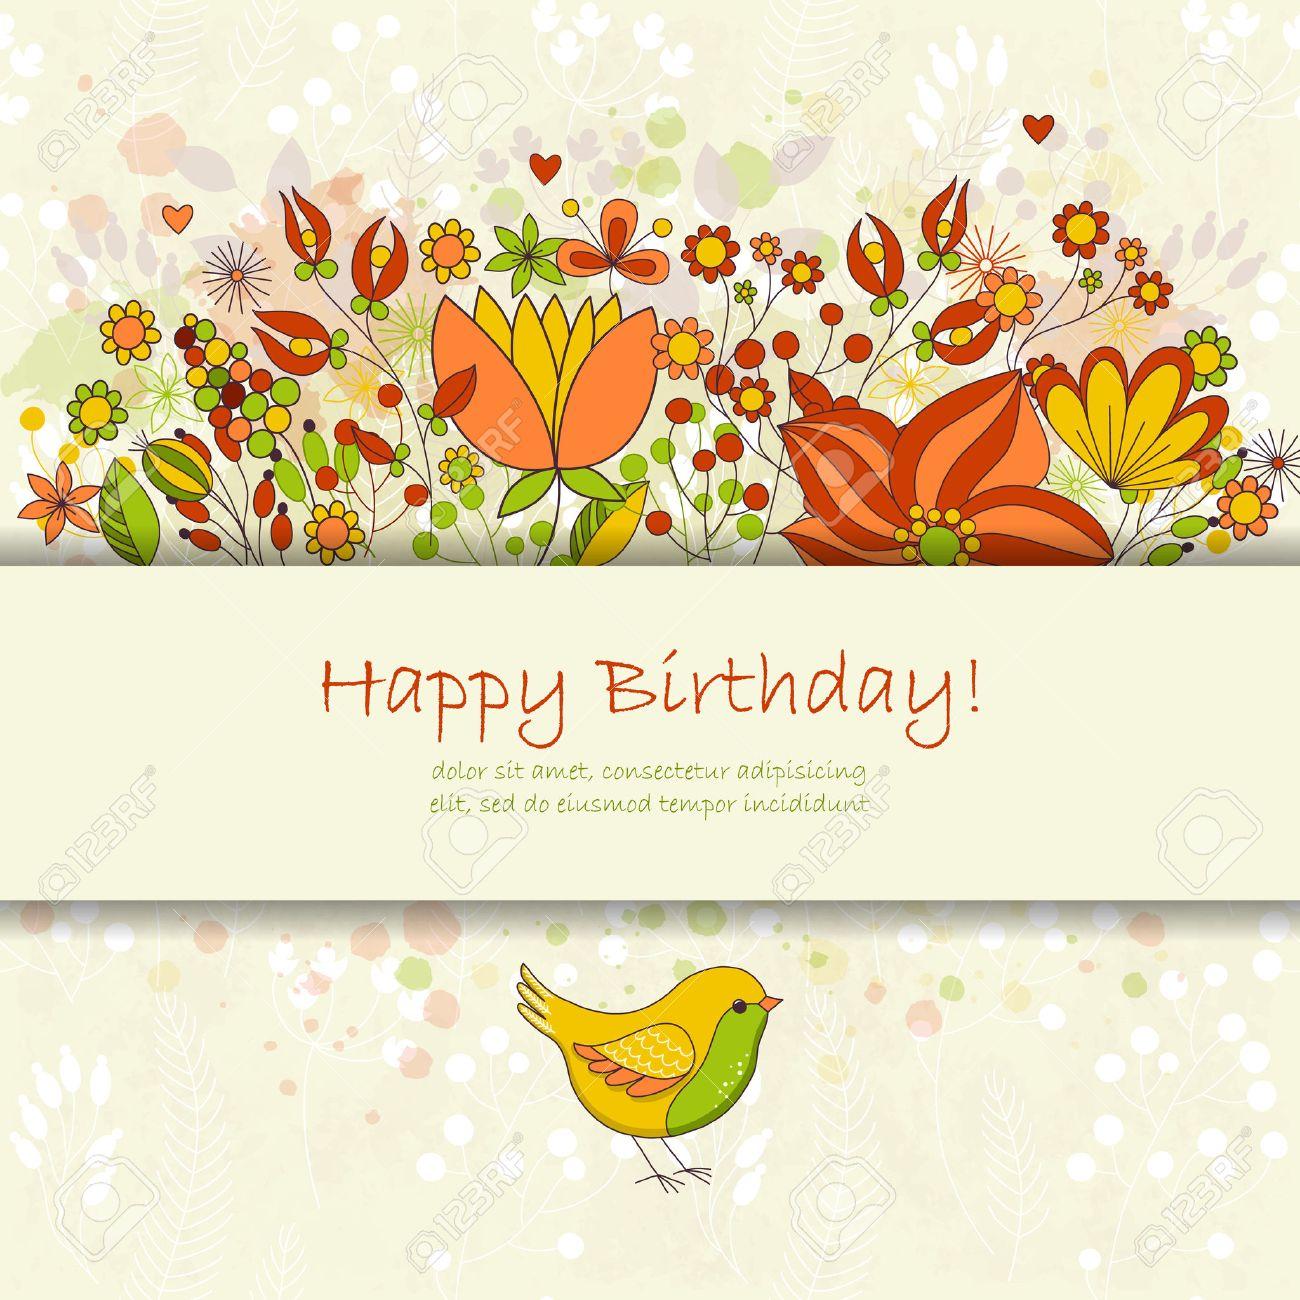 Happy birthday greeting card with flowers and bird cute colorful happy birthday greeting card with flowers and bird cute colorful floral party invitation reklamn izmirmasajfo